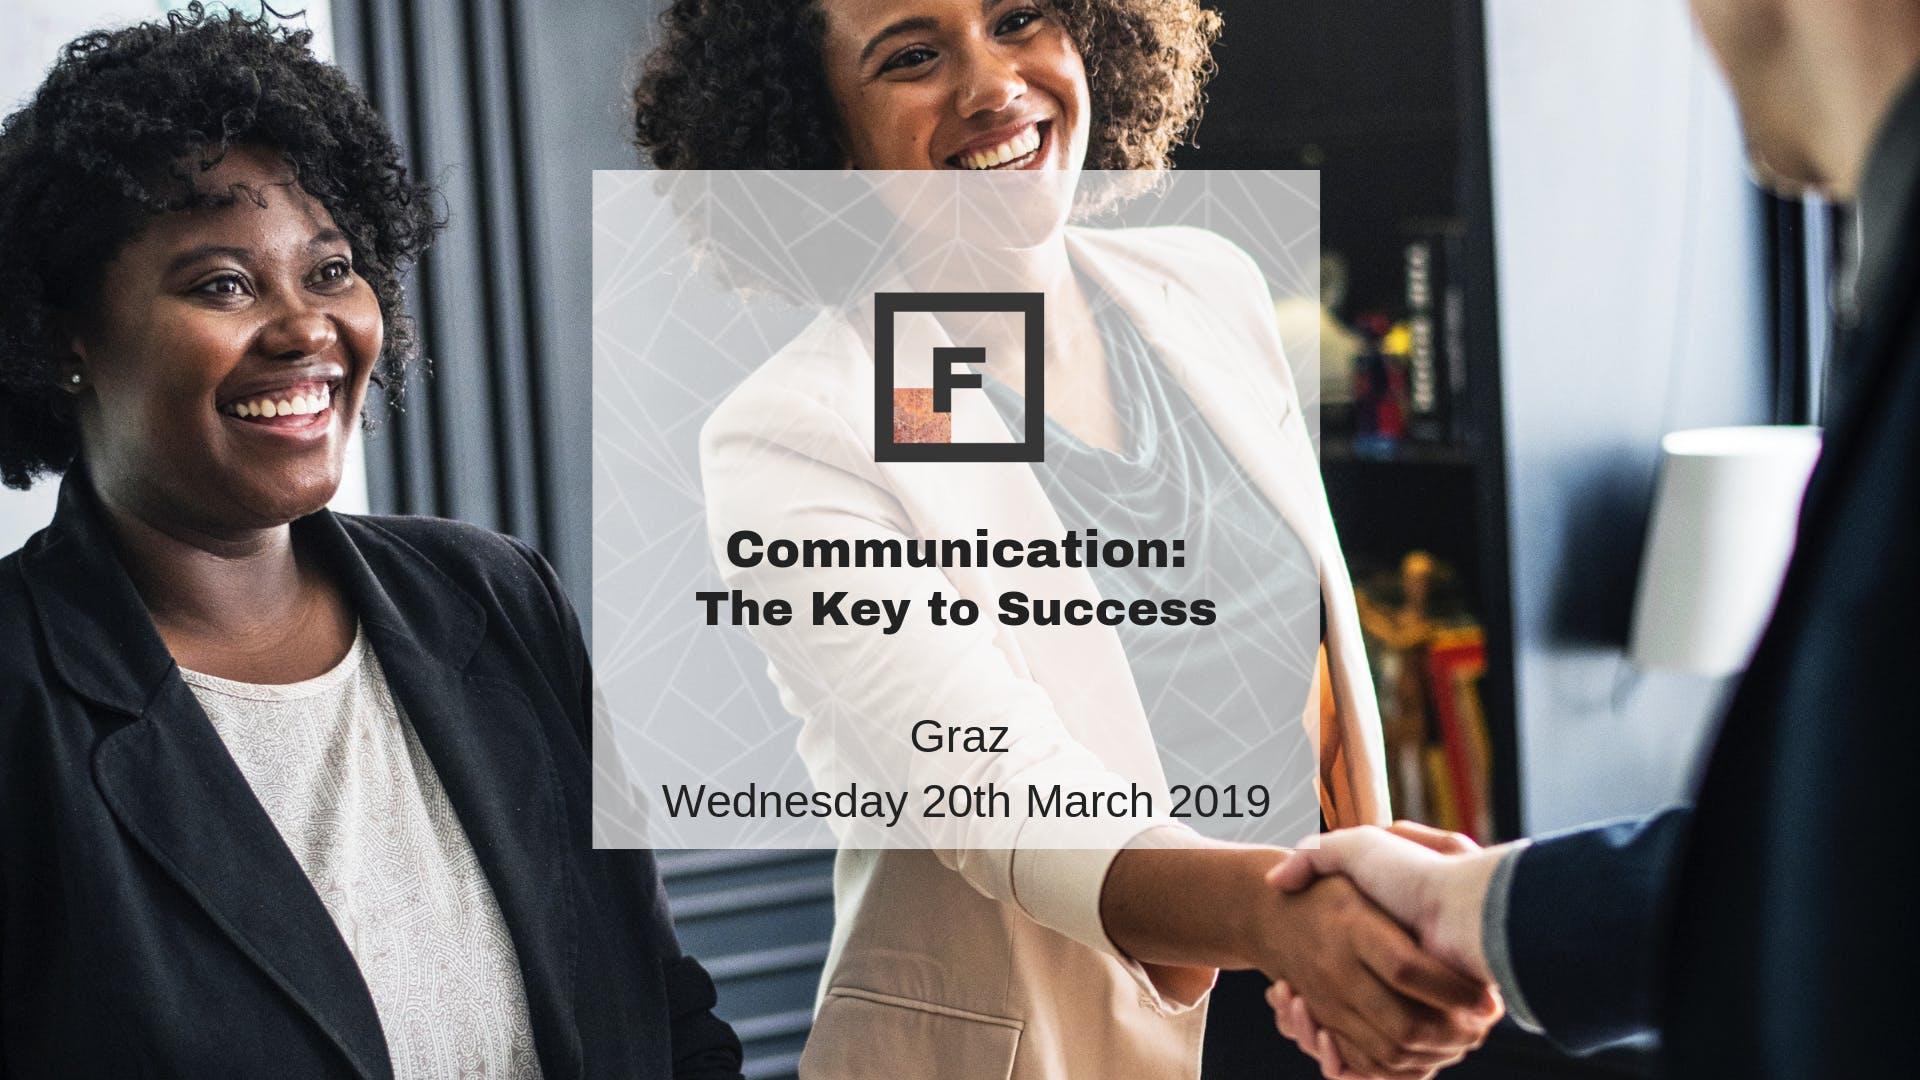 Future Females Graz: Communication - The Key